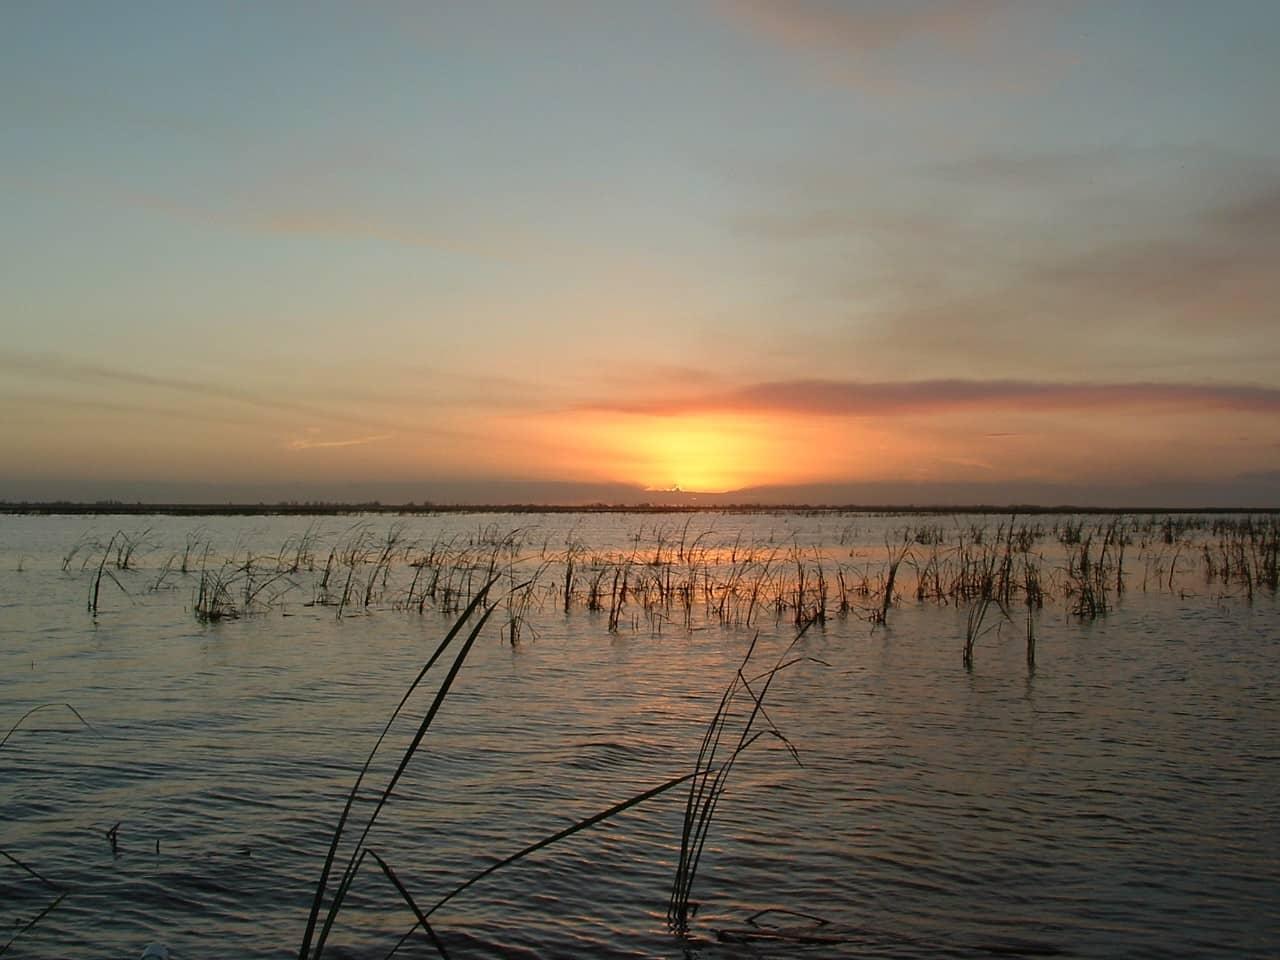 Pictures of lake okeechobee florida South - Central Florida Properties - Florida Real Estate